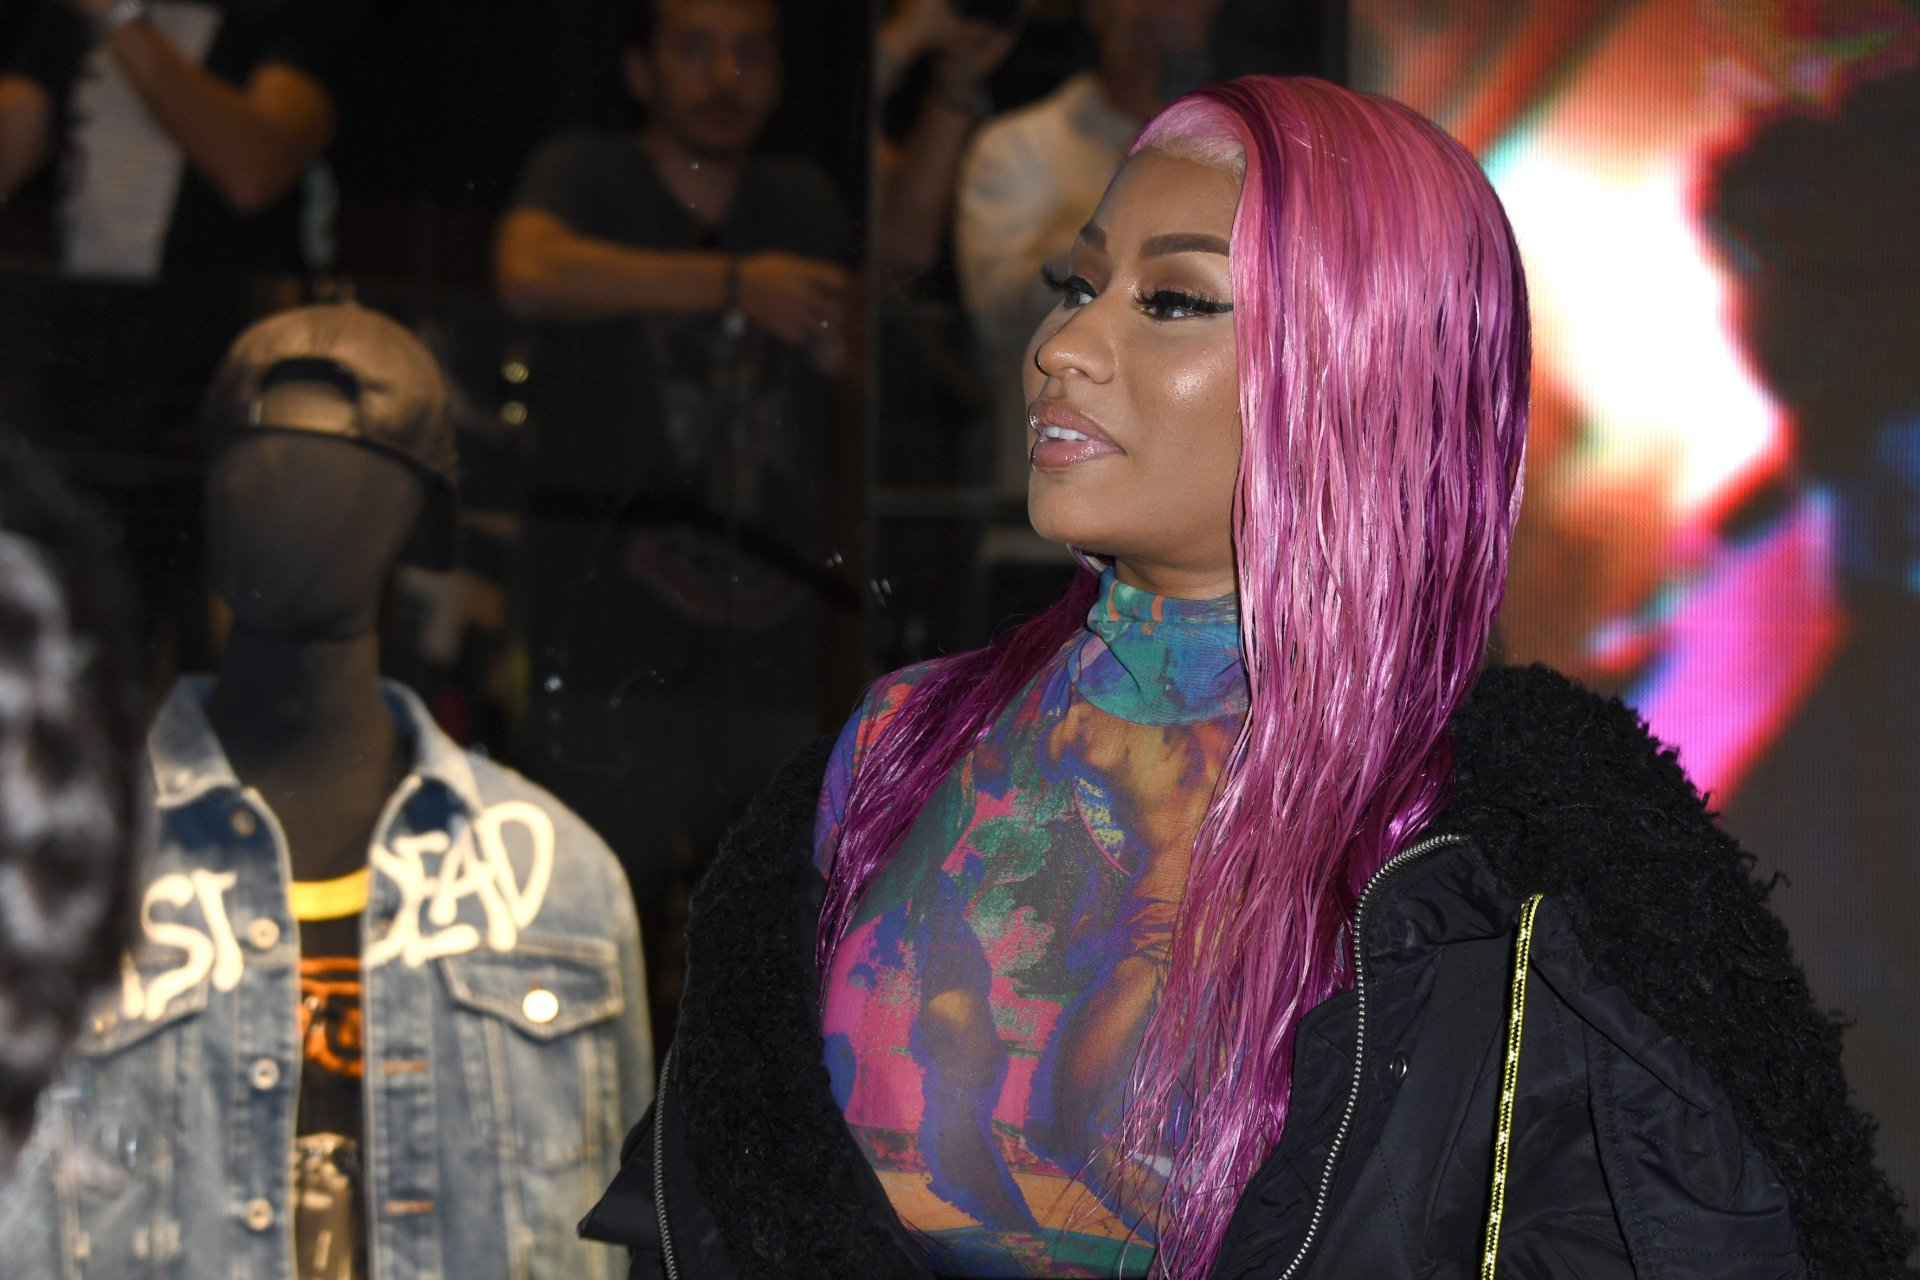 Nicki-Minaj-See-Through-TheFappeningBlog.com-40.jpg